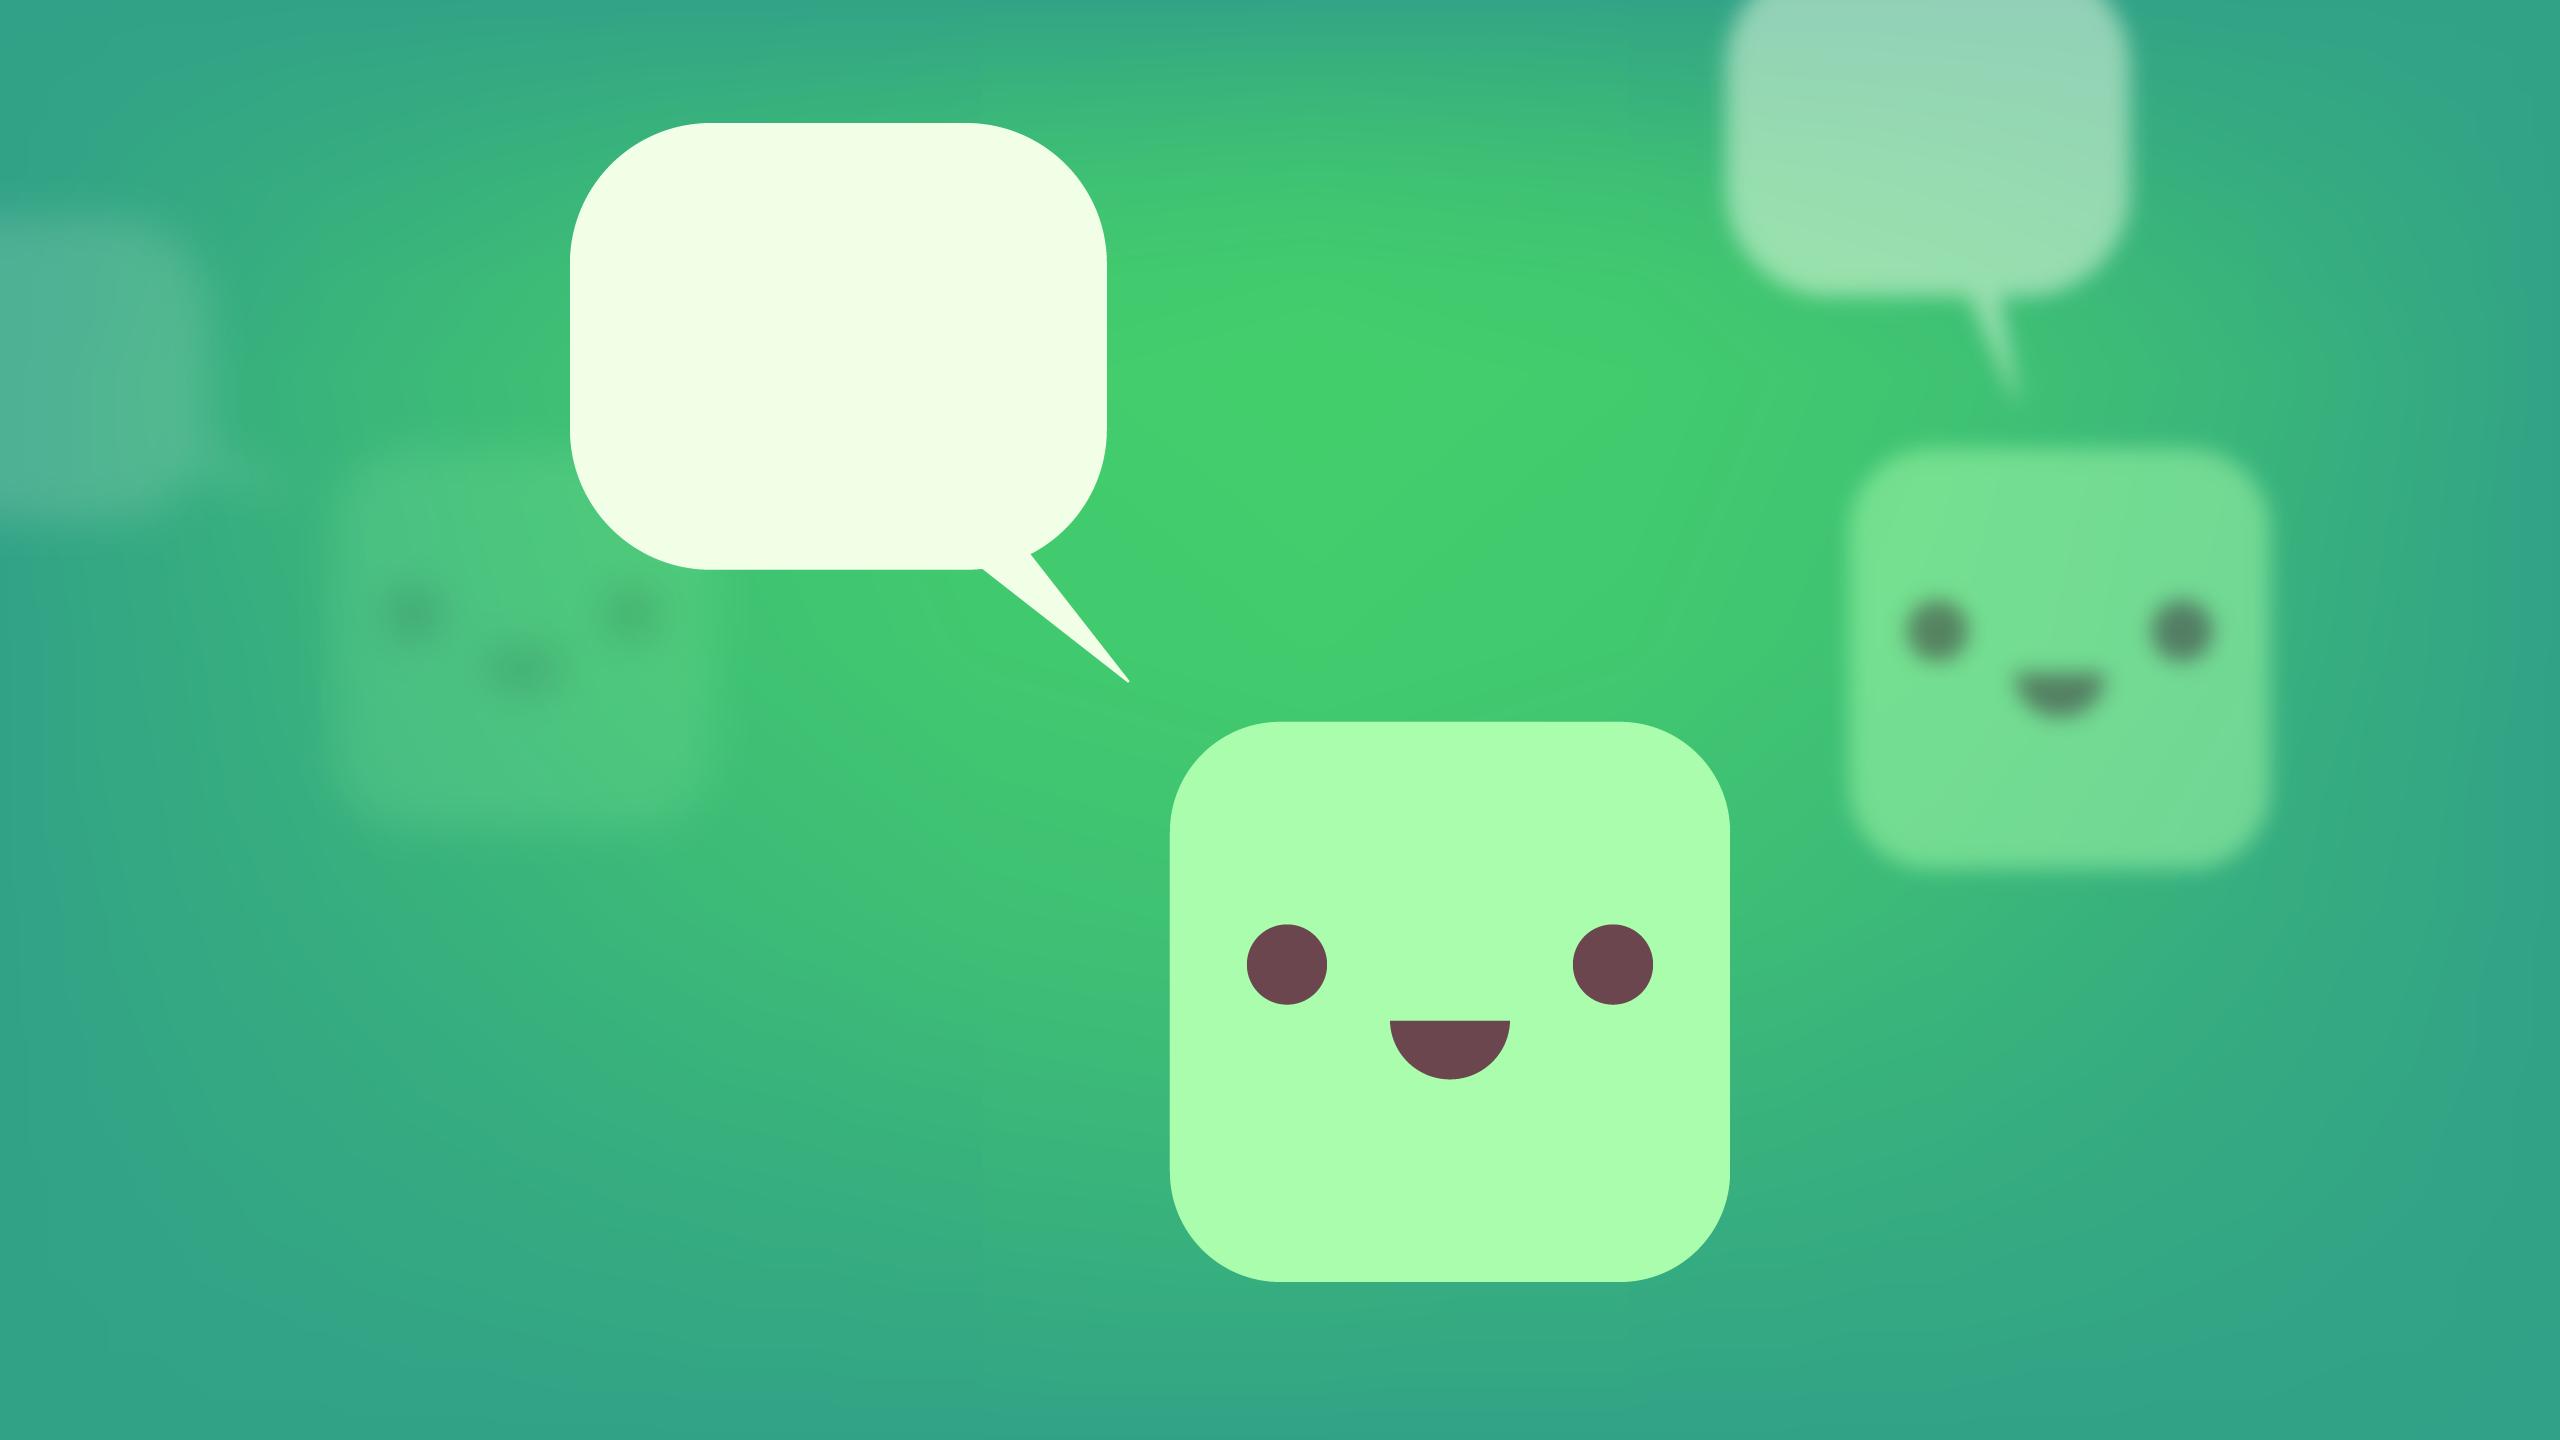 techcrunch.com - Natasha Lomas - Landbot gets $2.2M for its on-message 'anti-AI' chatbot